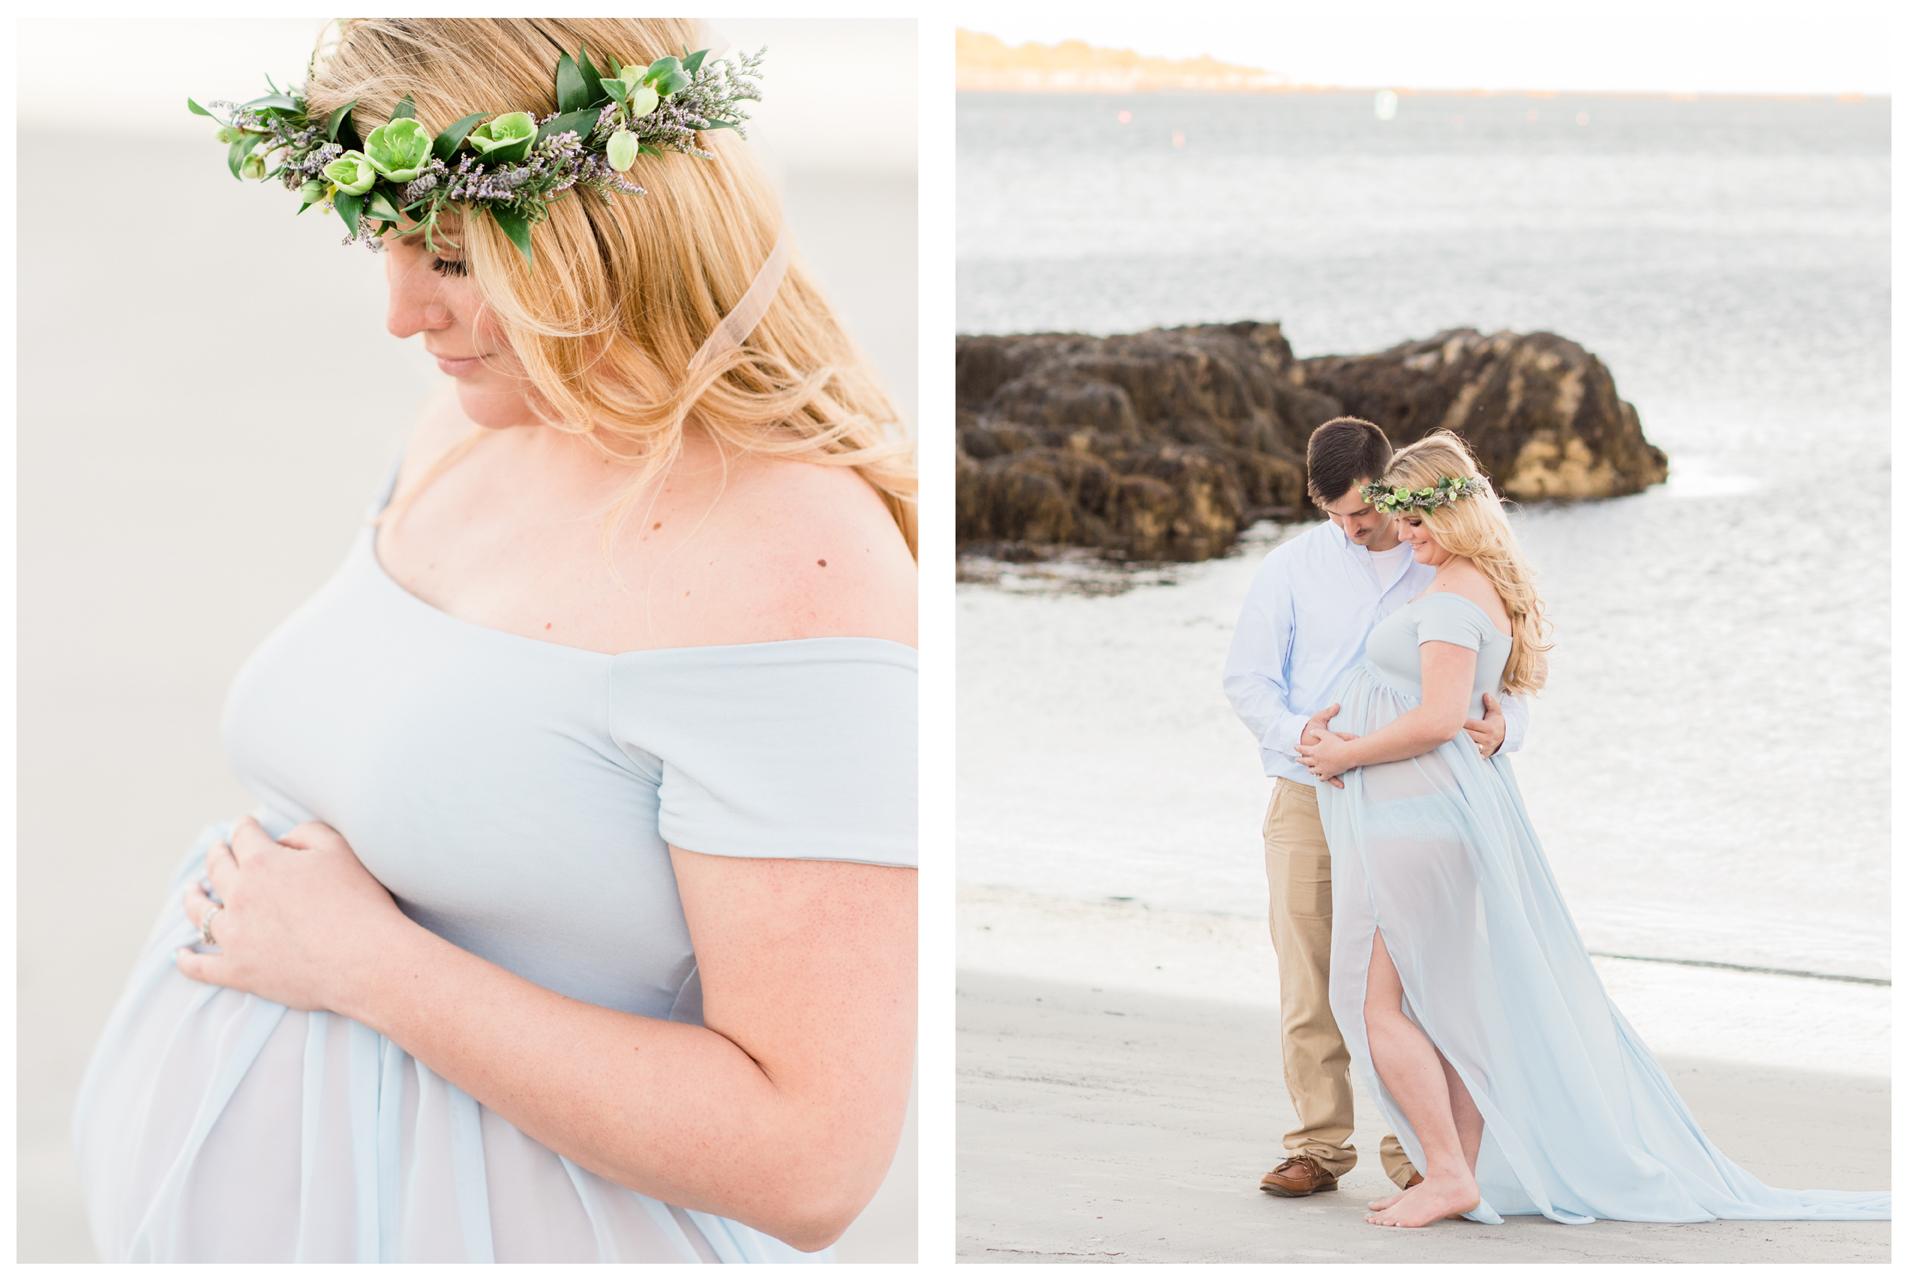 Maternity-Photographer-Sweet-Light-Portraits37.jpg